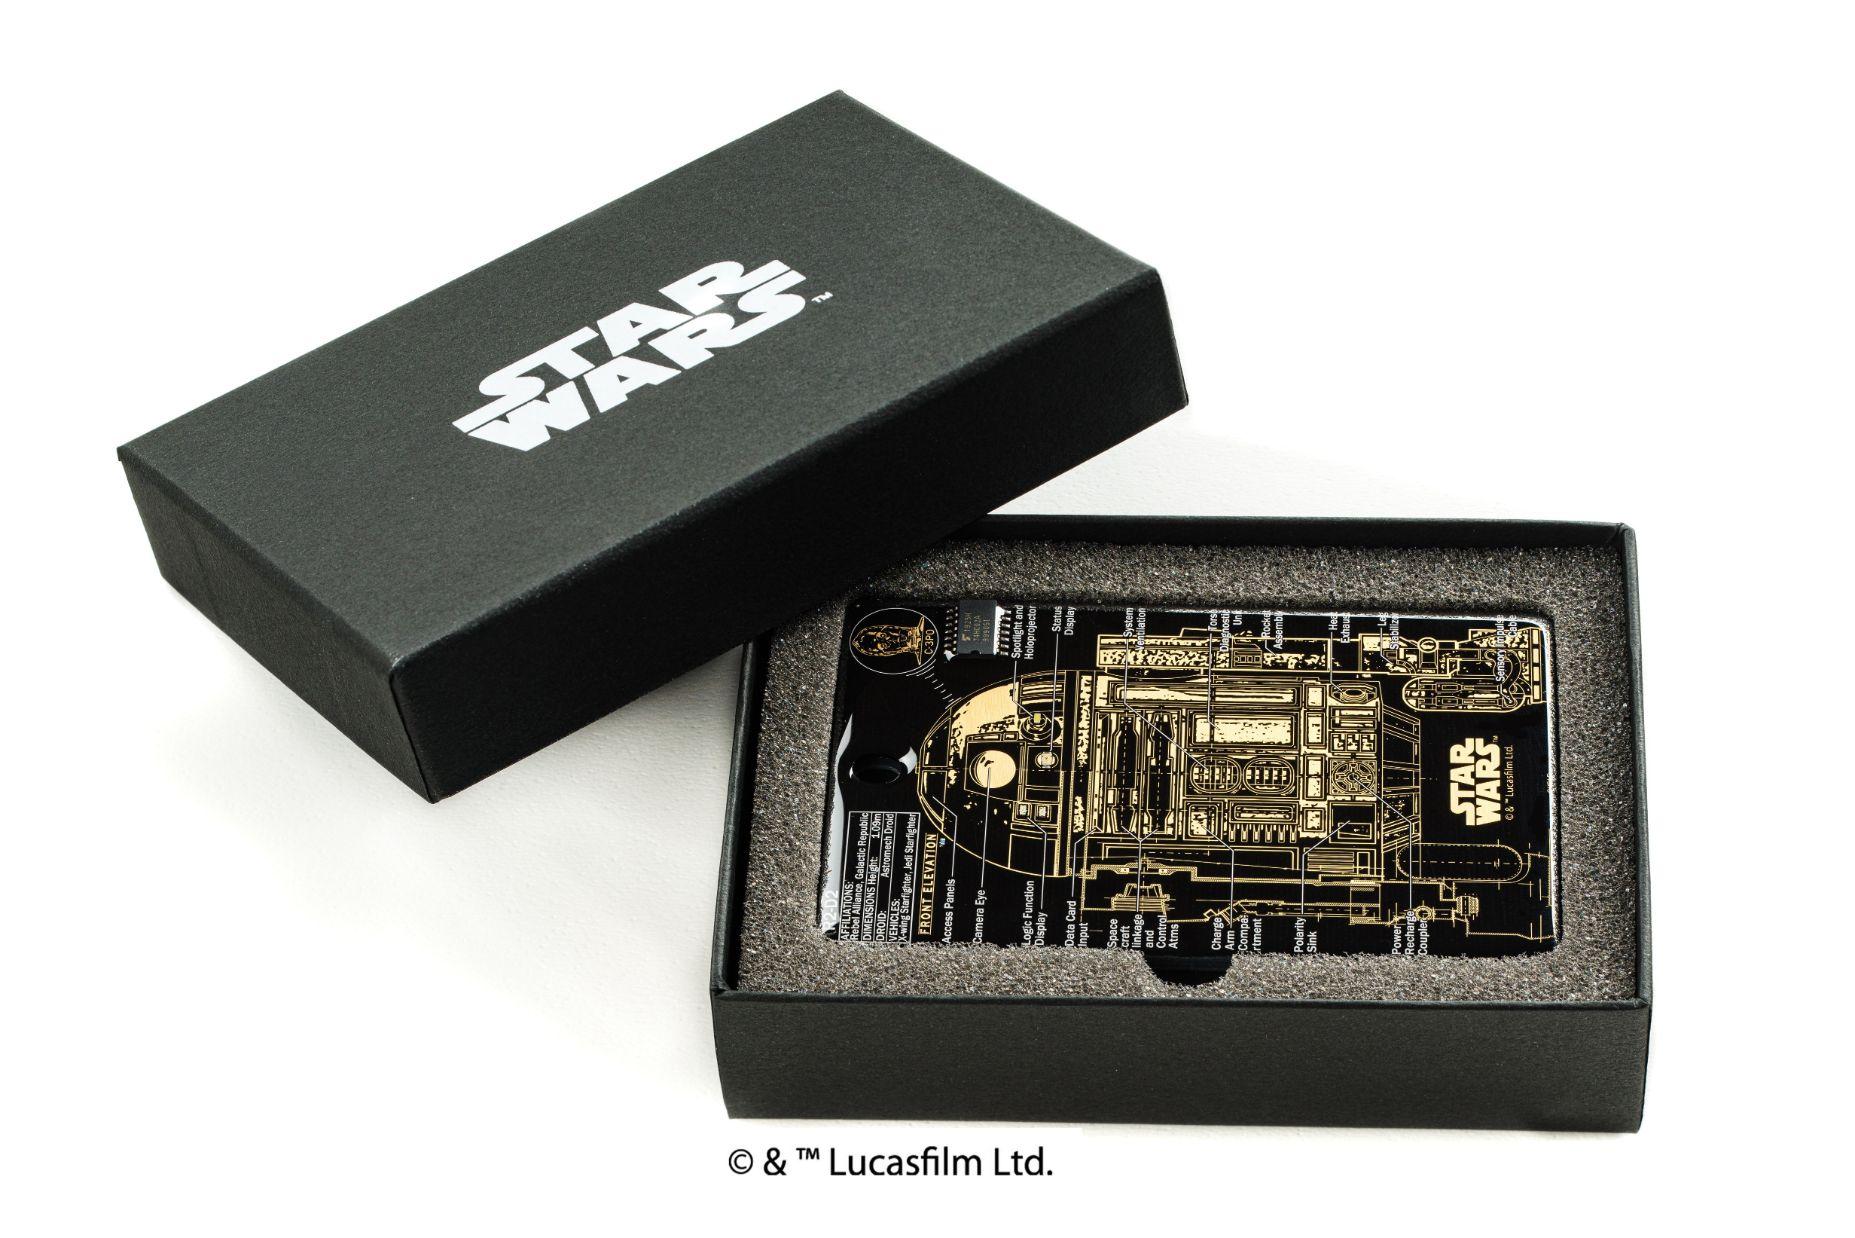 R2-D2 スターウォーズ スマホケース